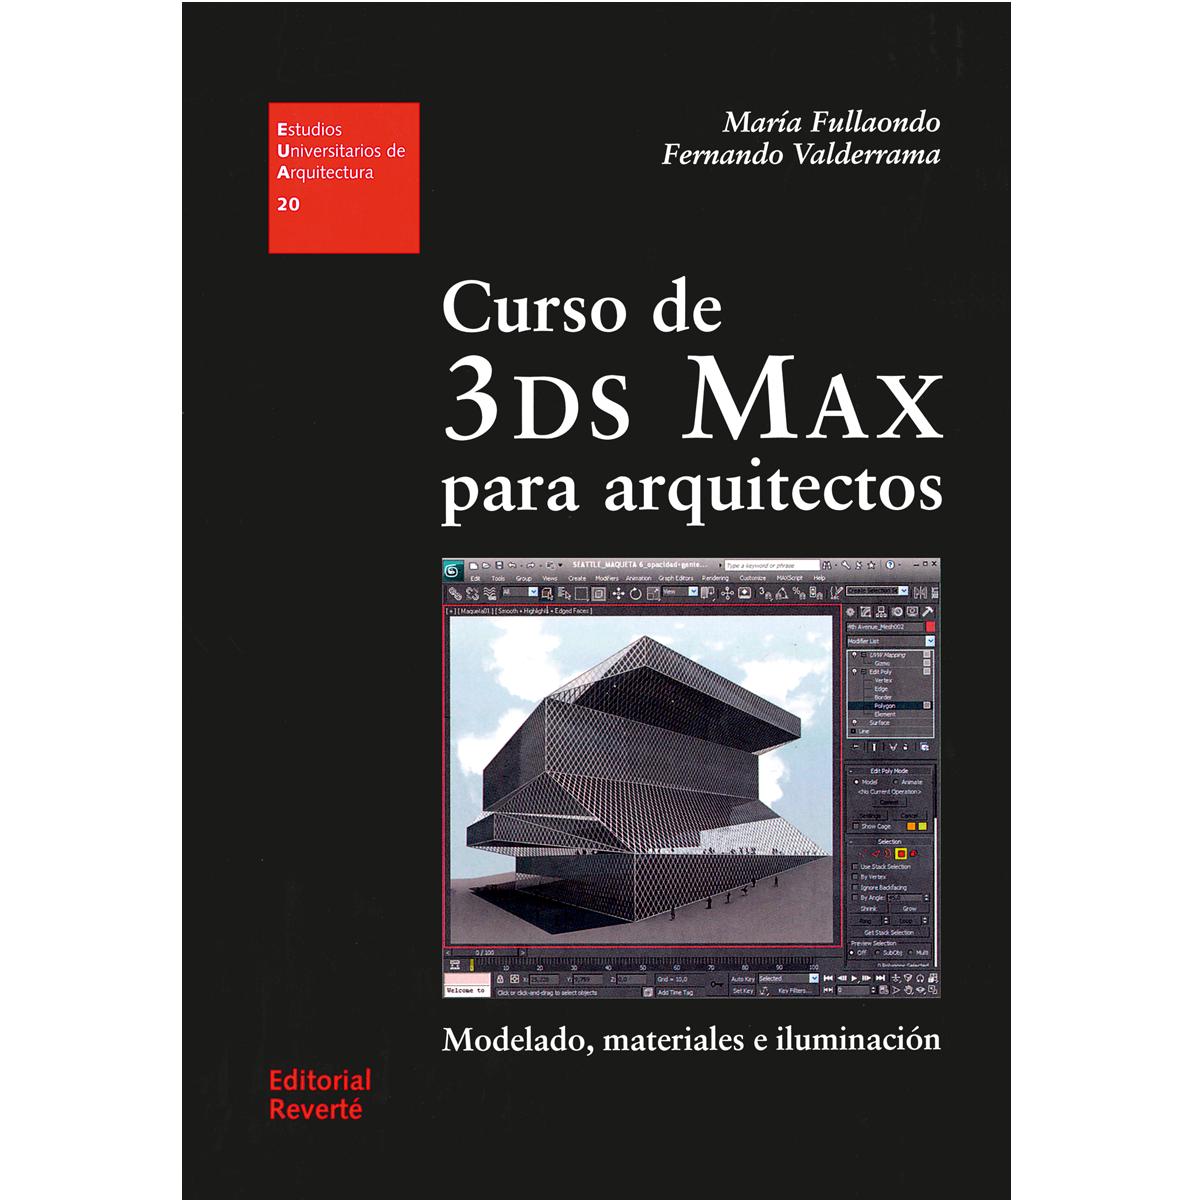 Curso de 3ds Max para arquitectos